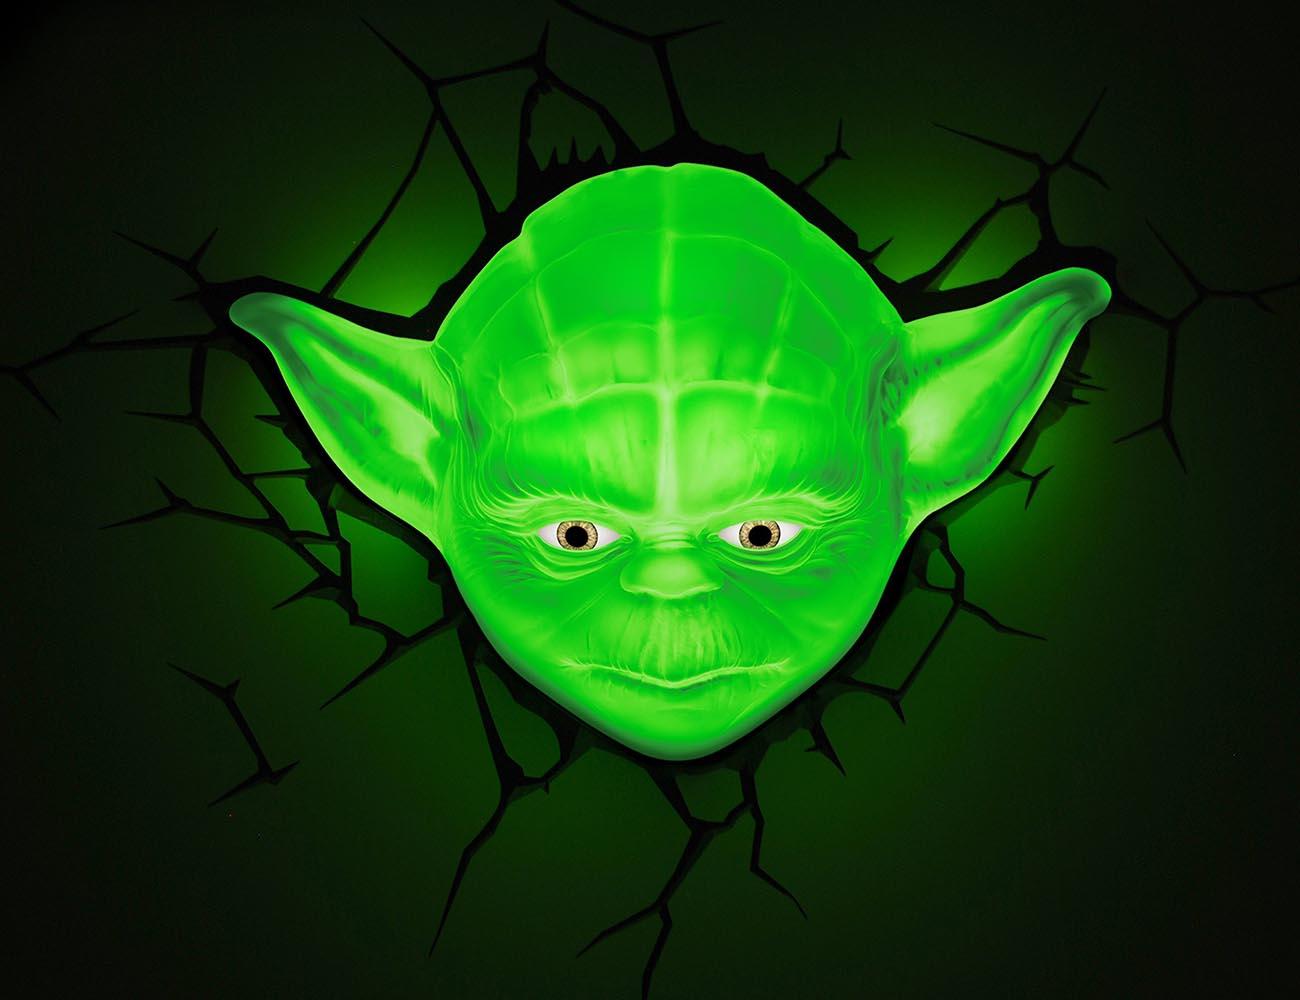 Star Wars Yoda 3d Wall Light With Remote Control : Star Wars Yoda 3D Deco Light Gadget Flow